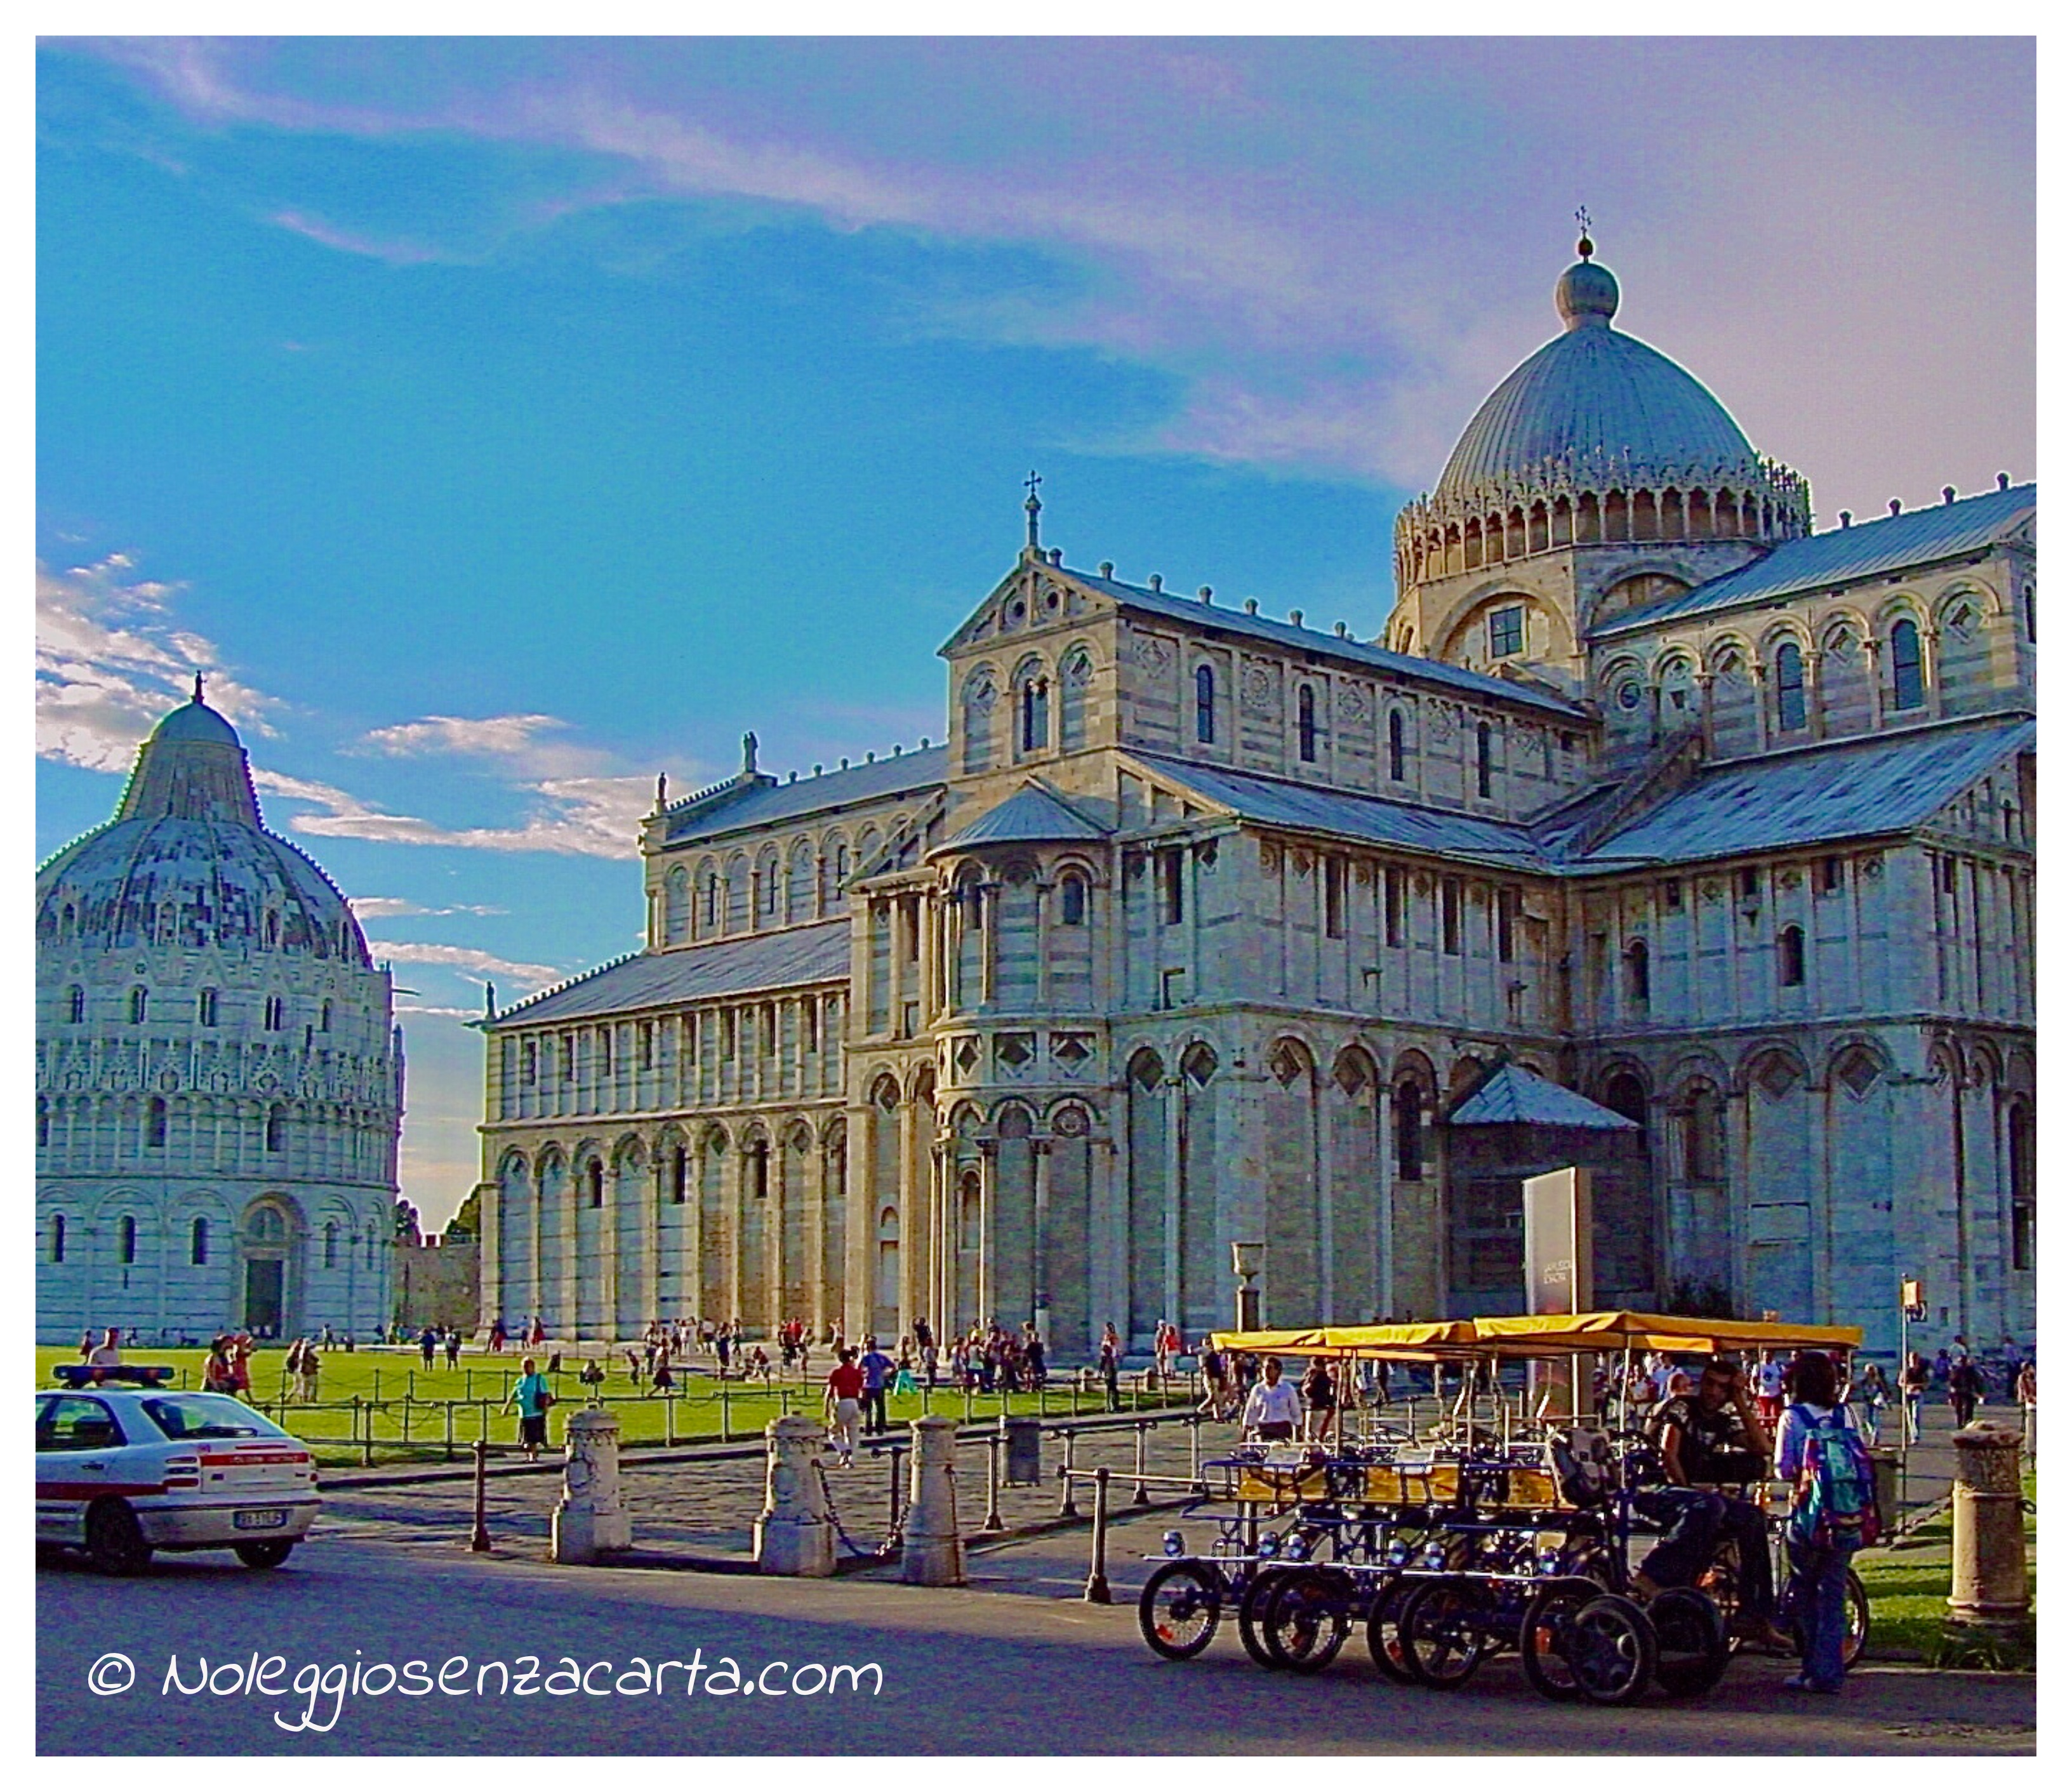 Alquiler coche Pisa sans tarjeta de crédito